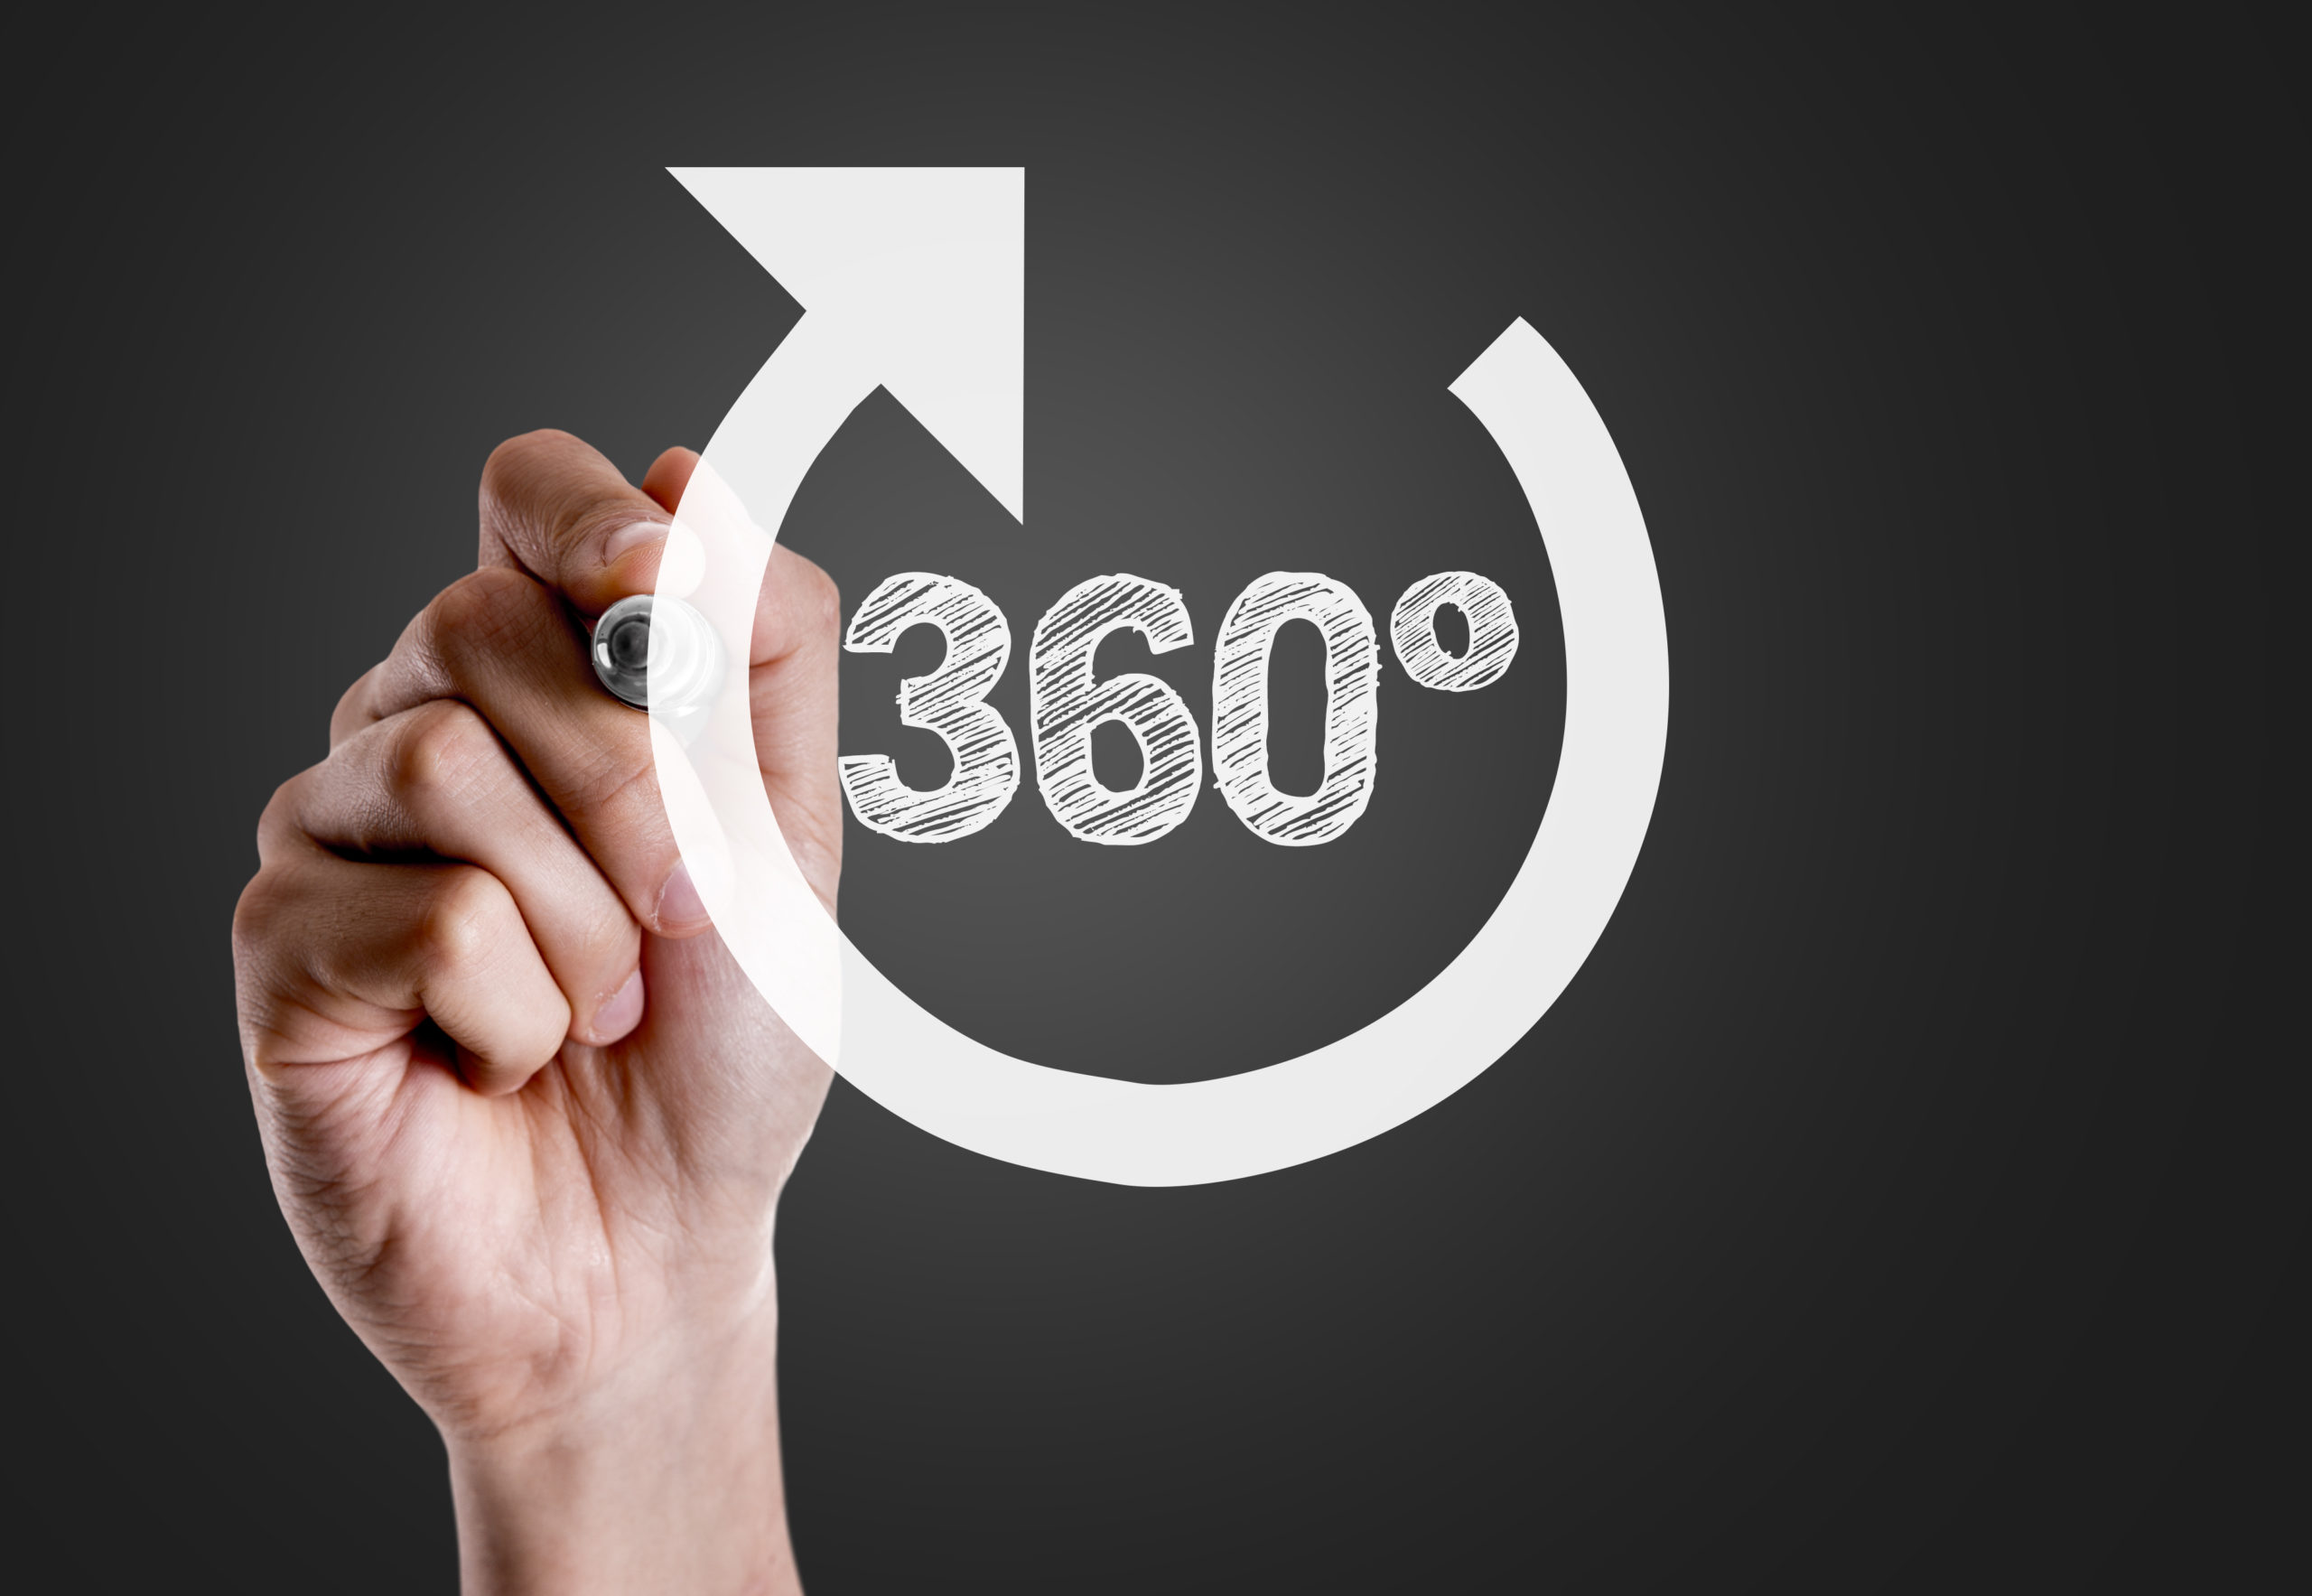 writing 360 on the board